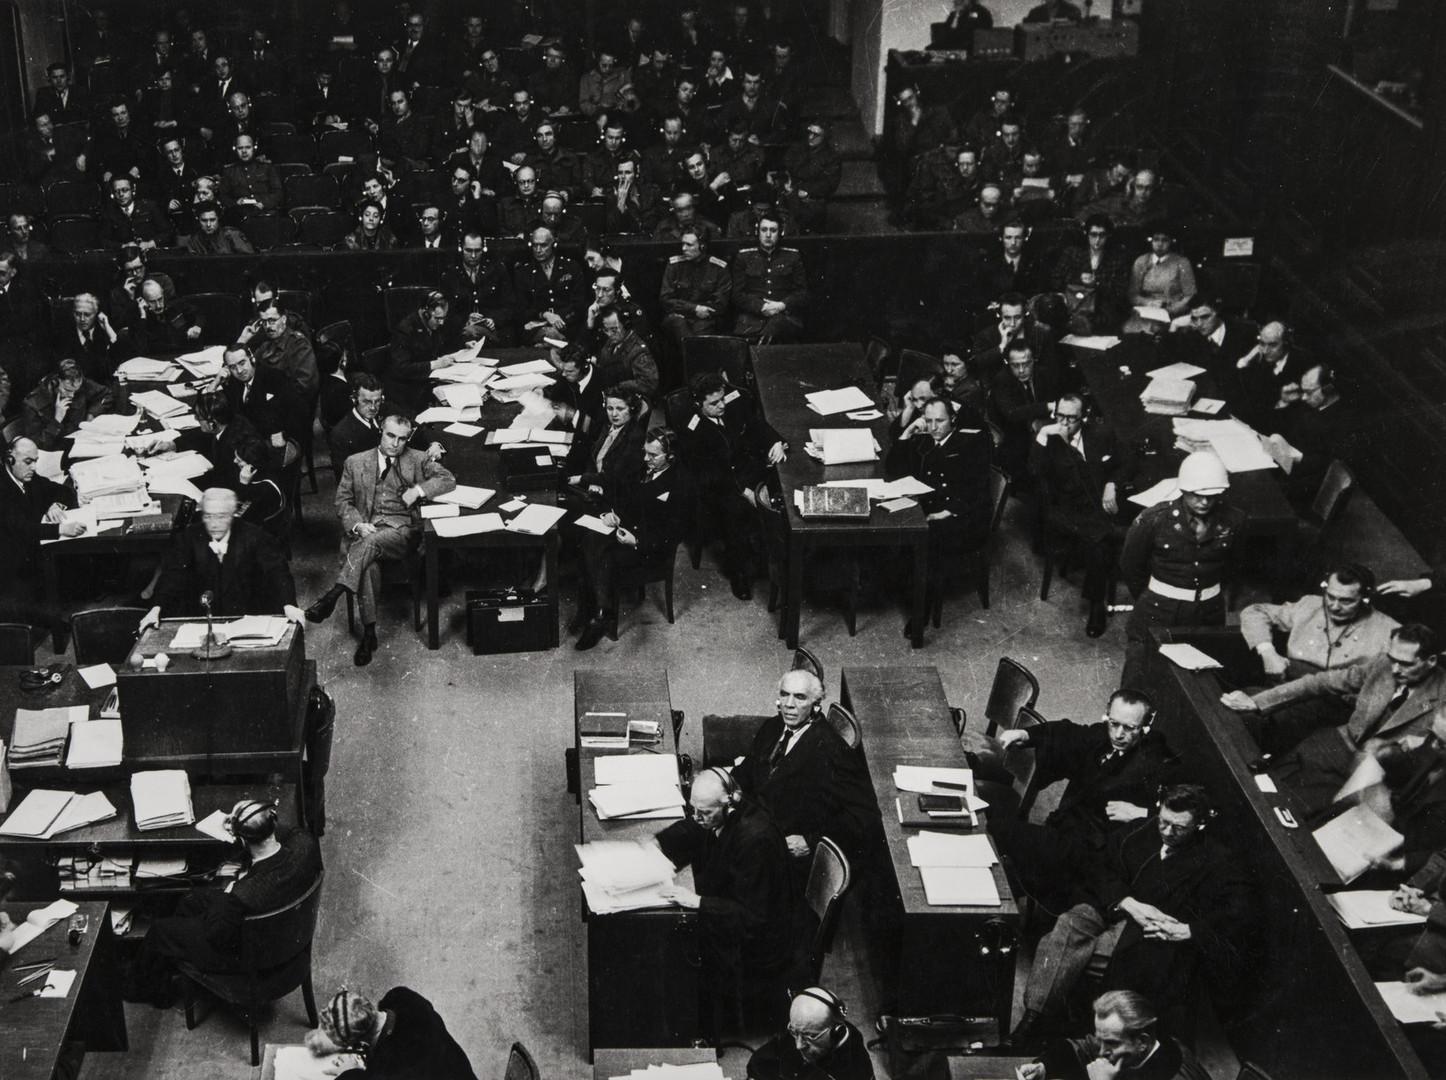 Е. А. Халдей.    Нюрнбергский процесс, зал заседаний   1946